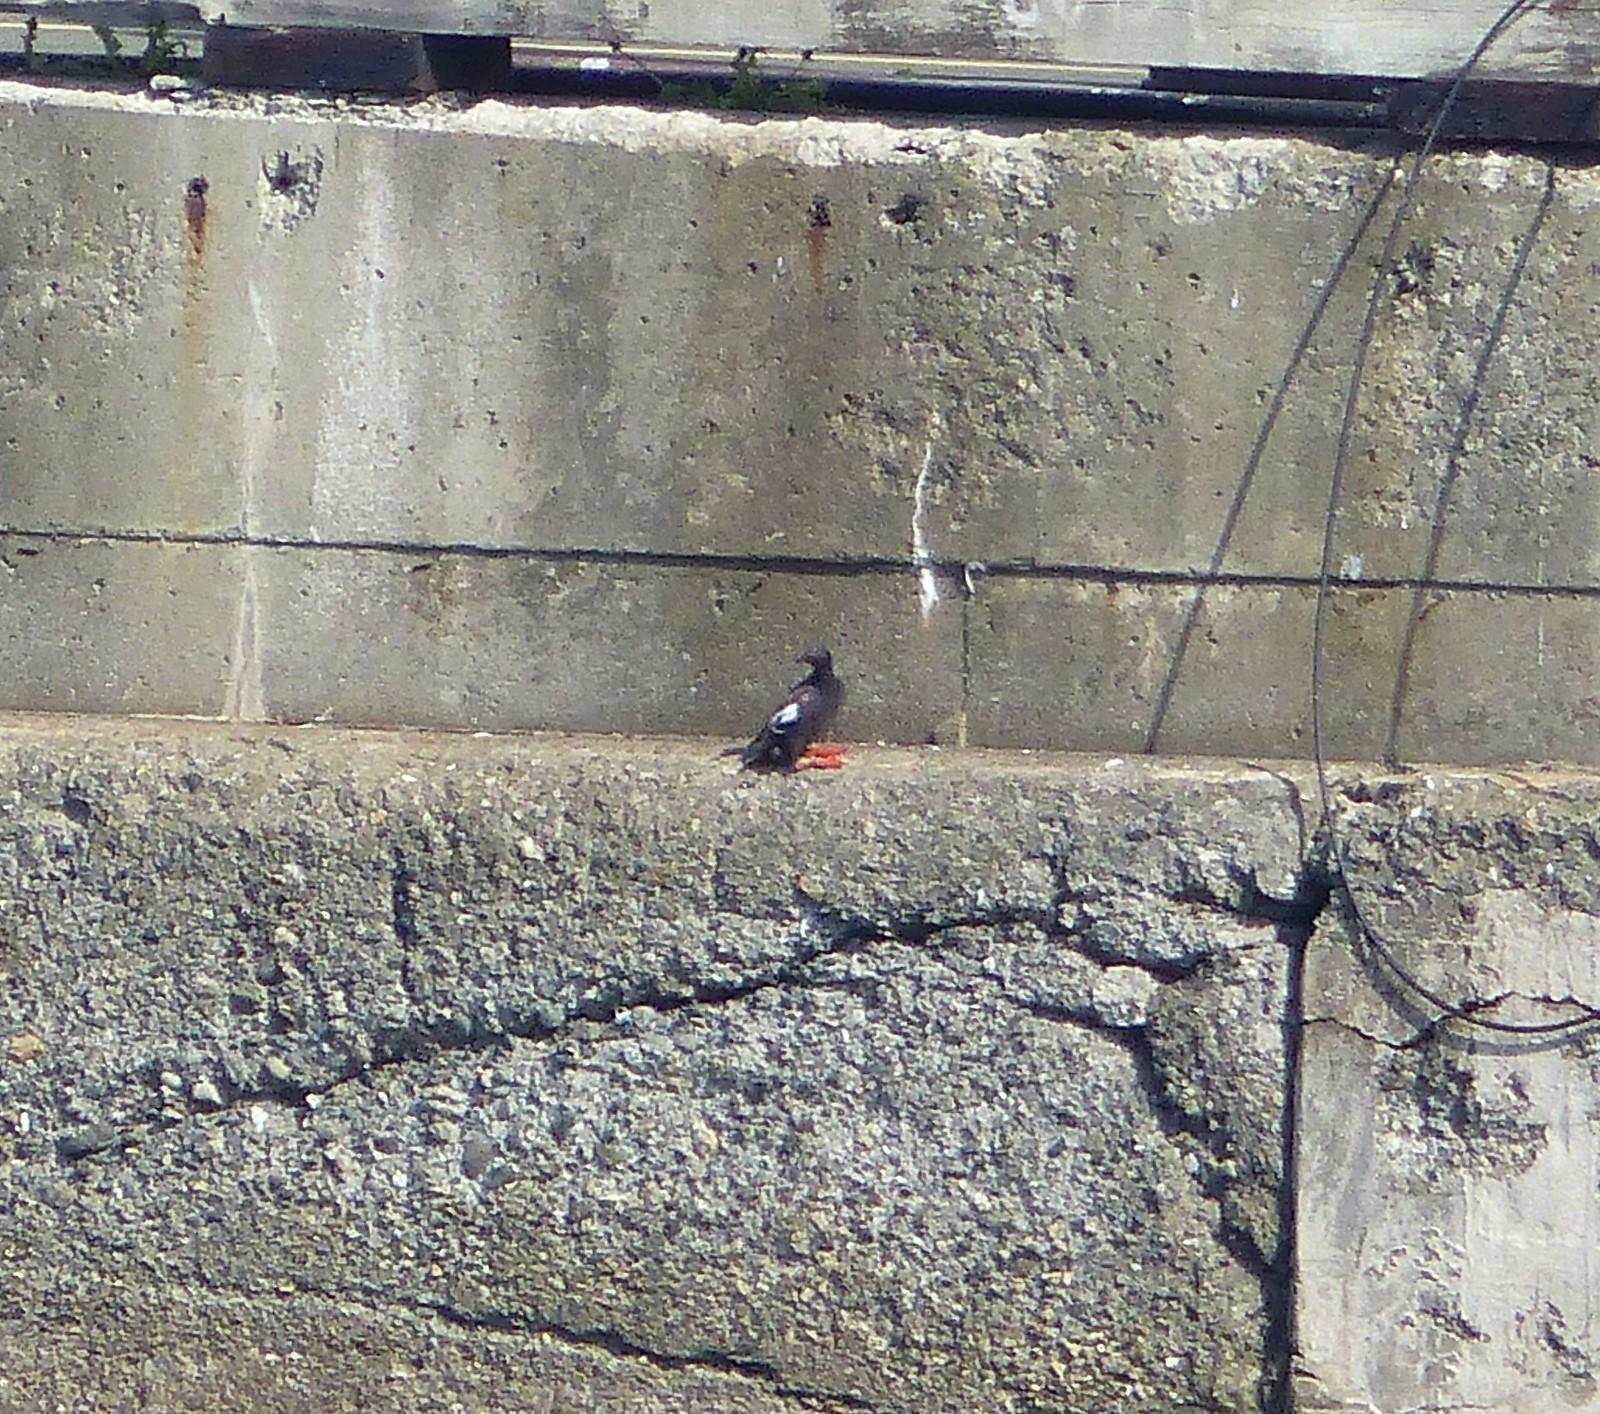 Pigeon Guillemot, Ogden Pt. Breakwater, Victoria, BC, 8-6-16, M. Long (6)